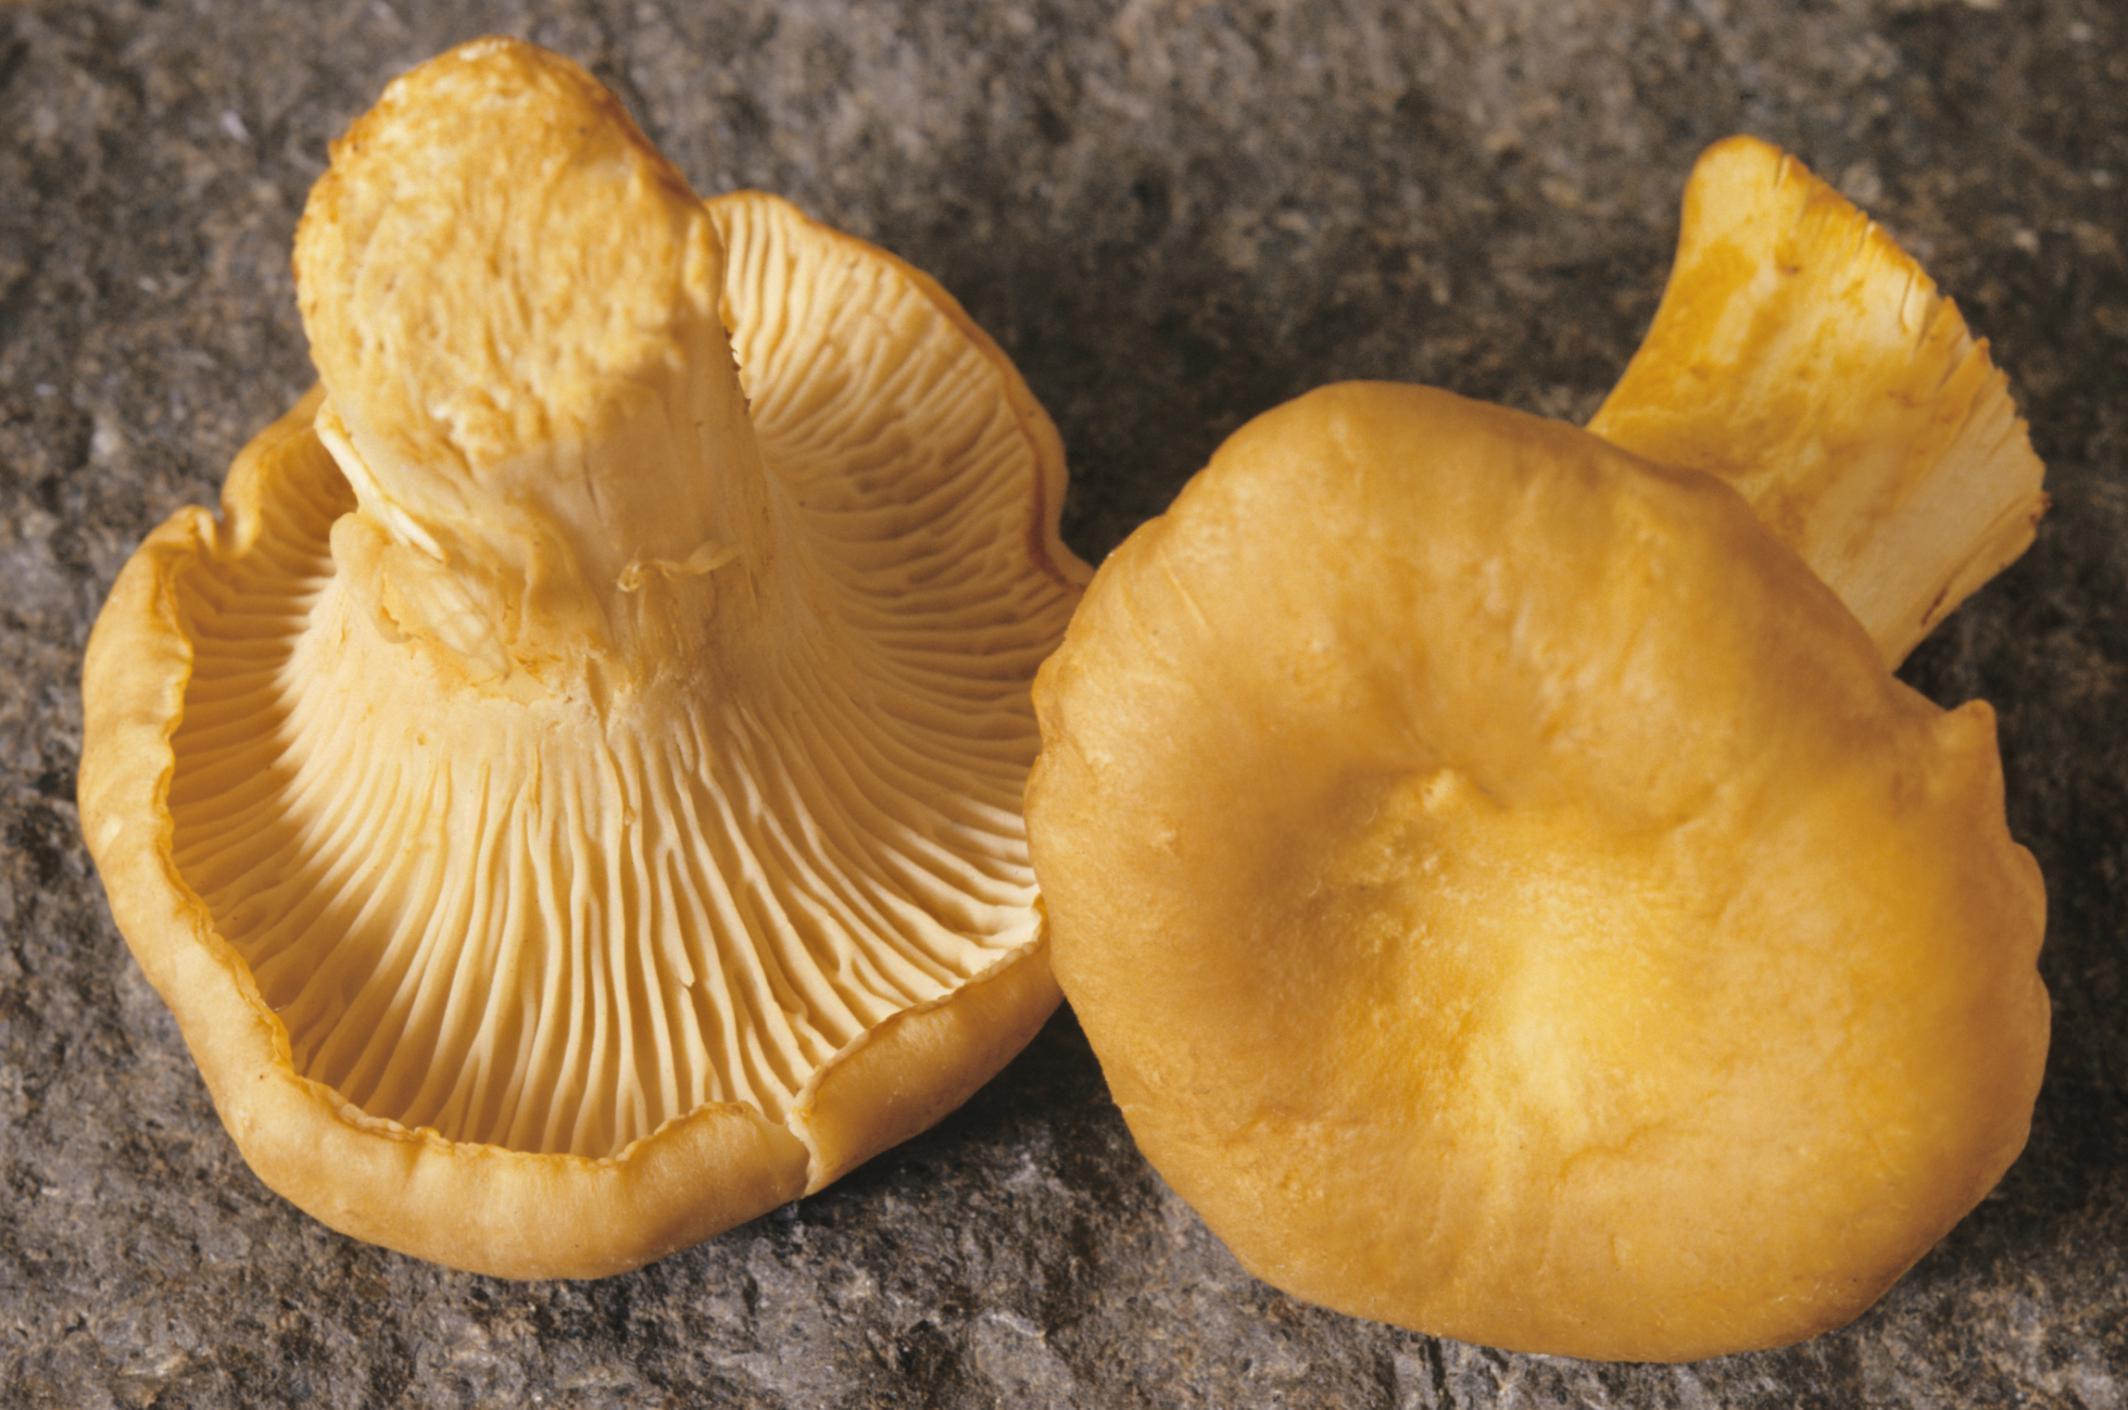 How To Preserve Chanterelle Mushrooms